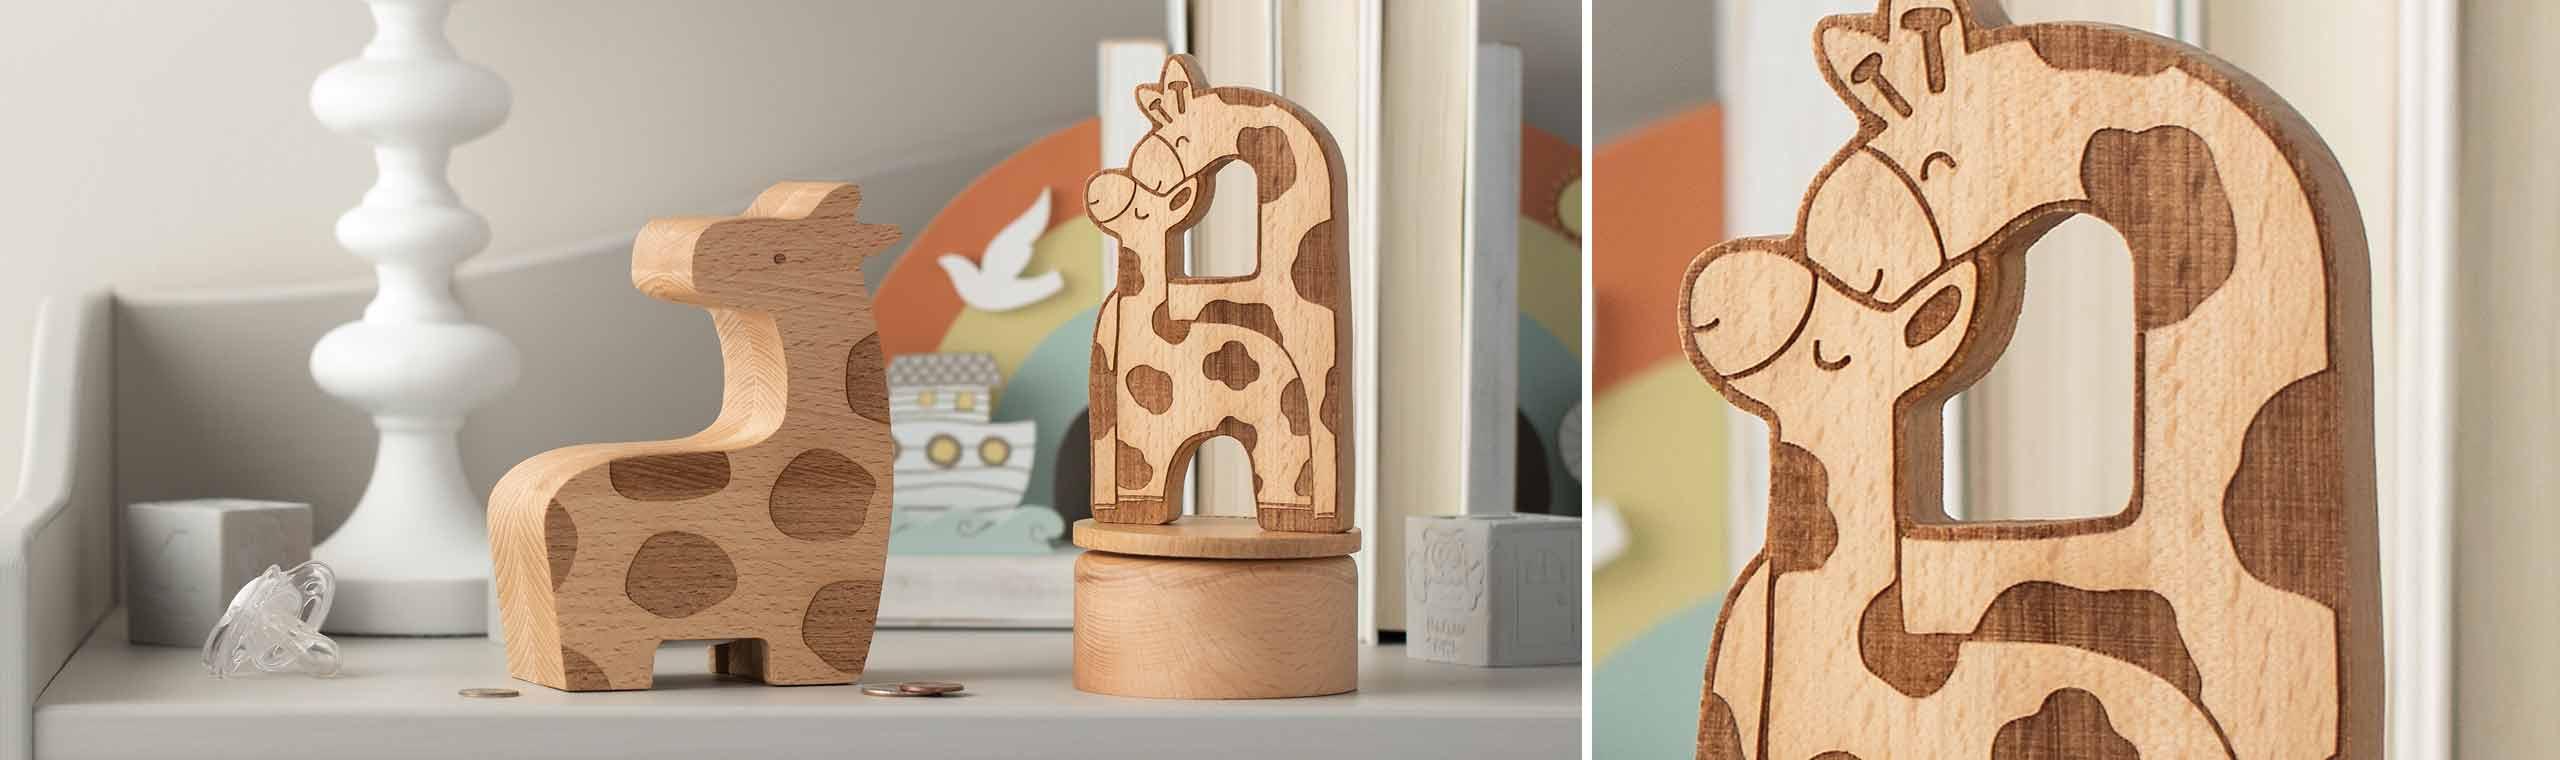 little wooden giraffes on a white table